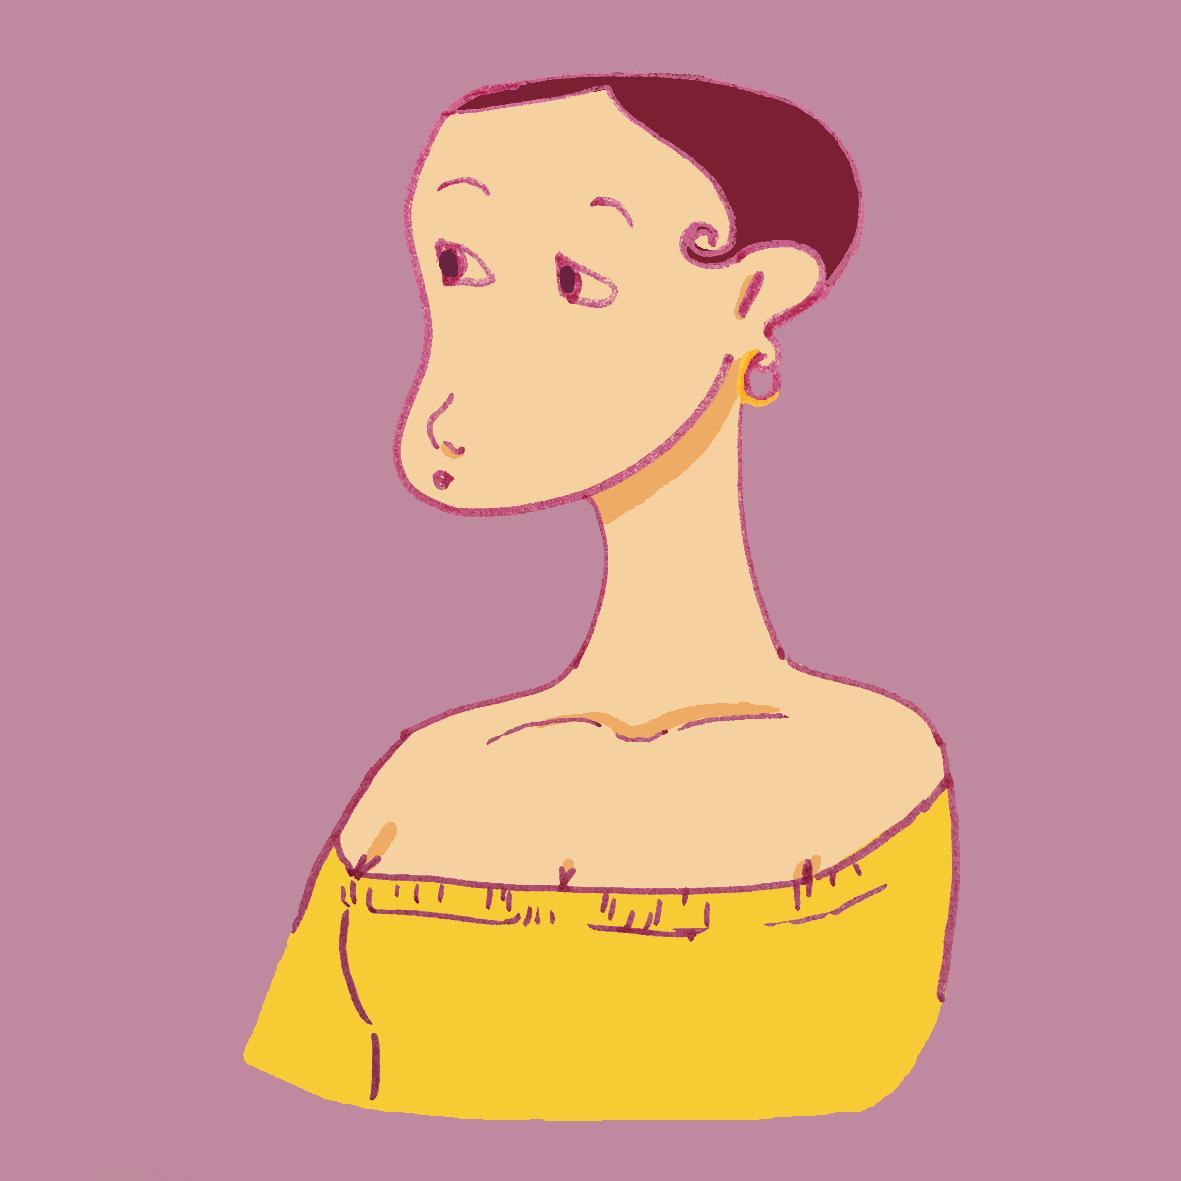 short_hair_girl.png